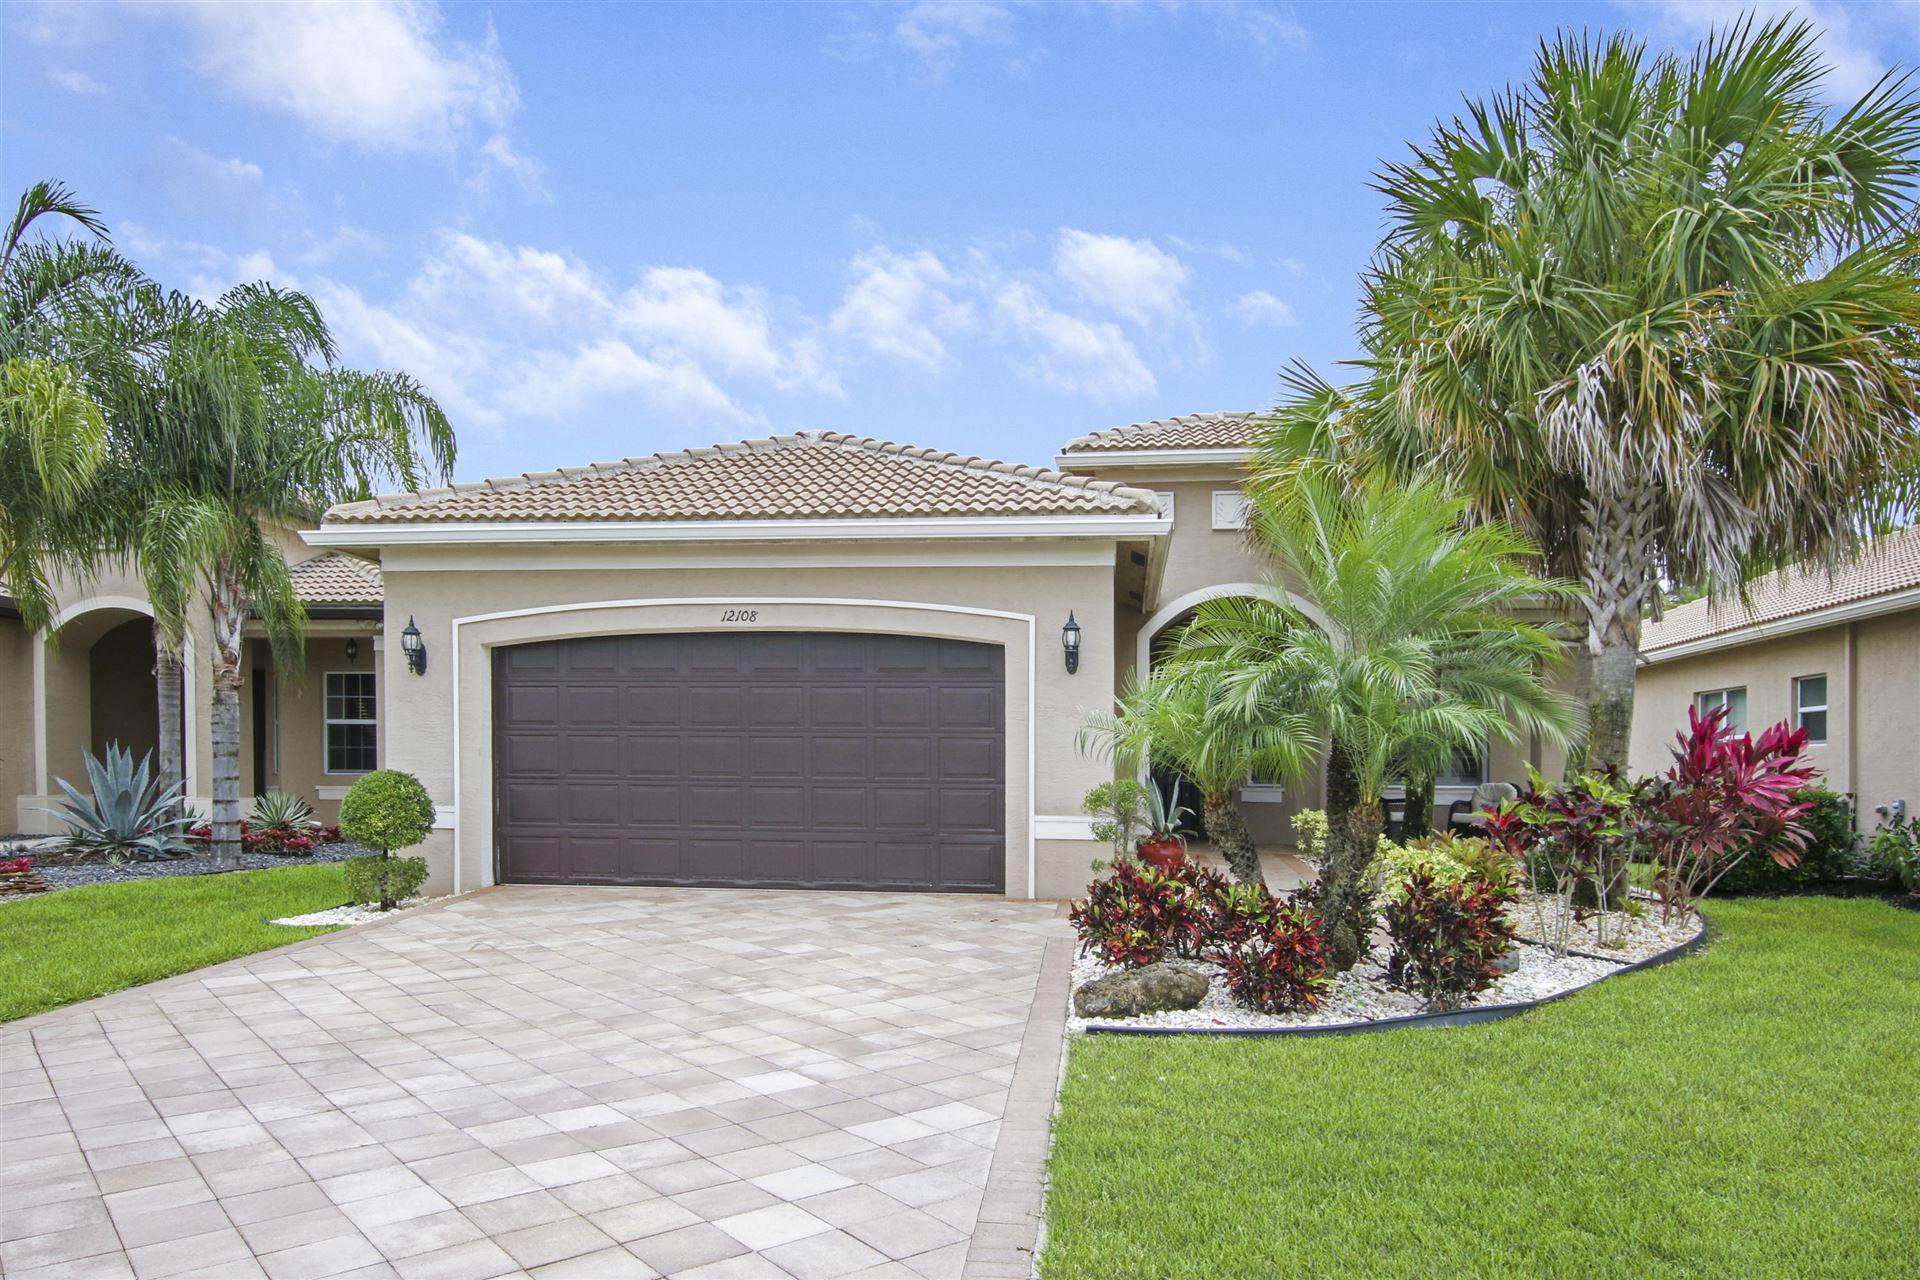 12108 Neptune Peak Drive, Boynton Beach, FL 33473 - MLS#: RX-10714299